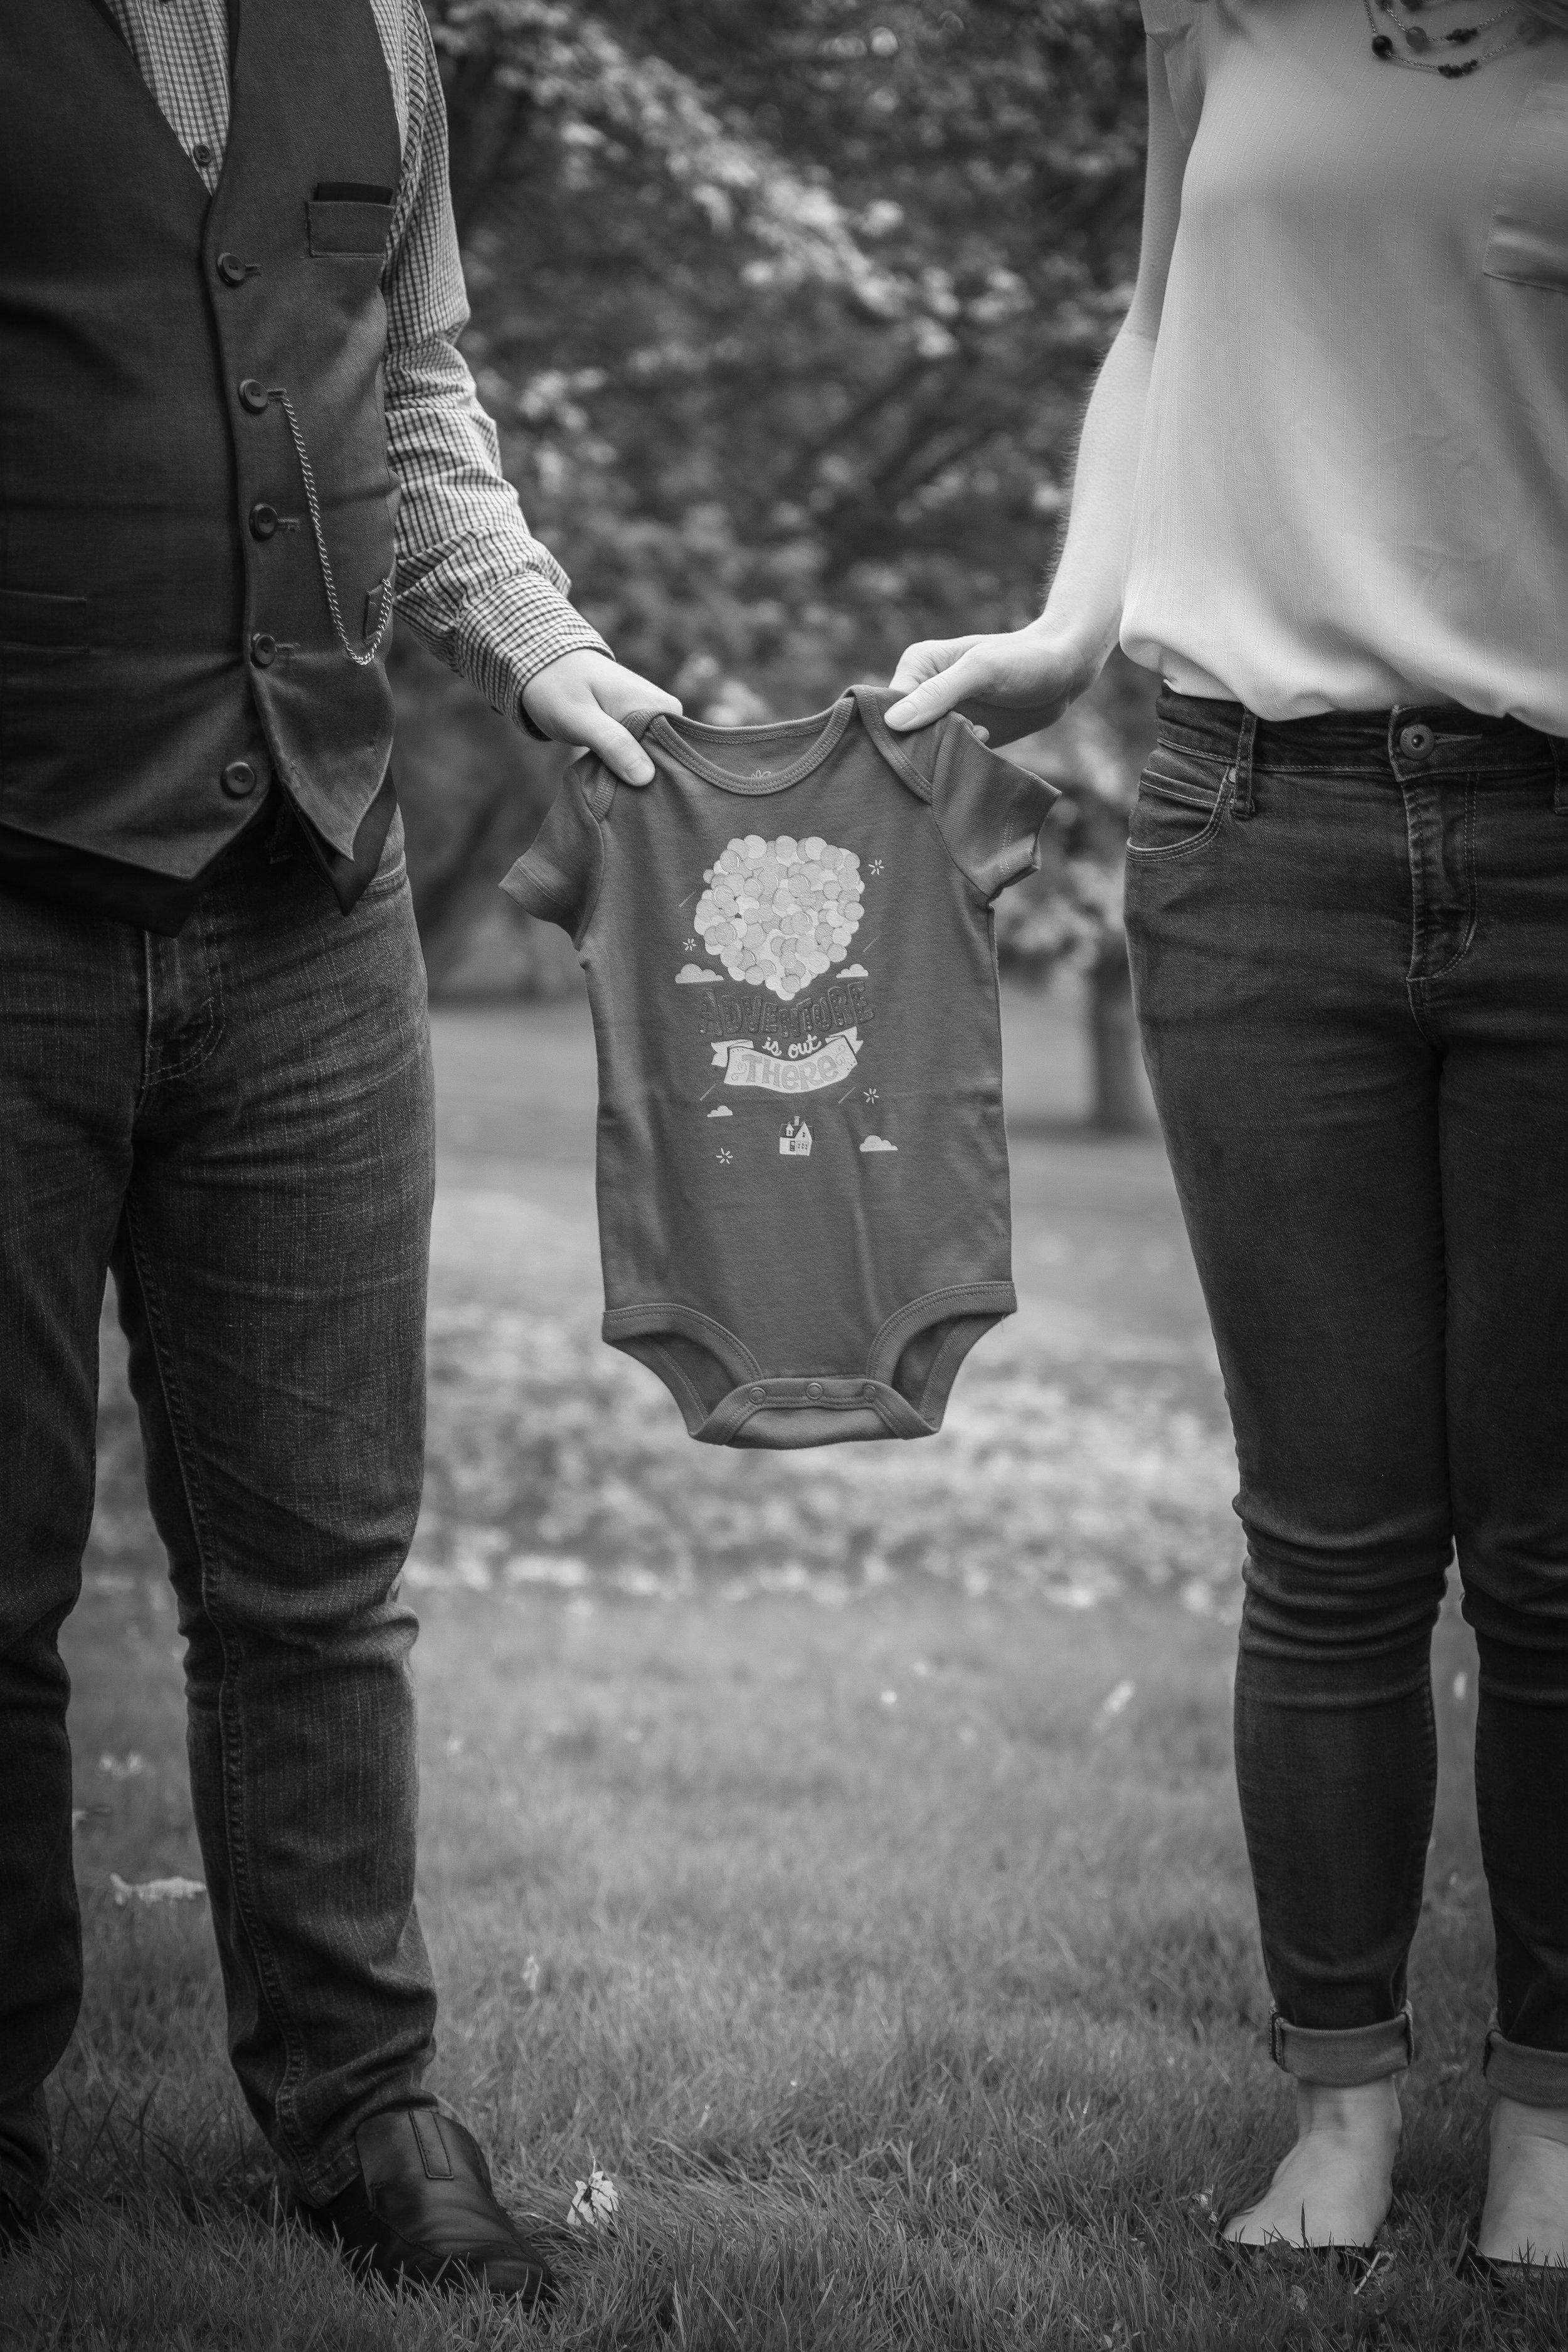 Pregnancy Announcement - Wright Park - Tacoma